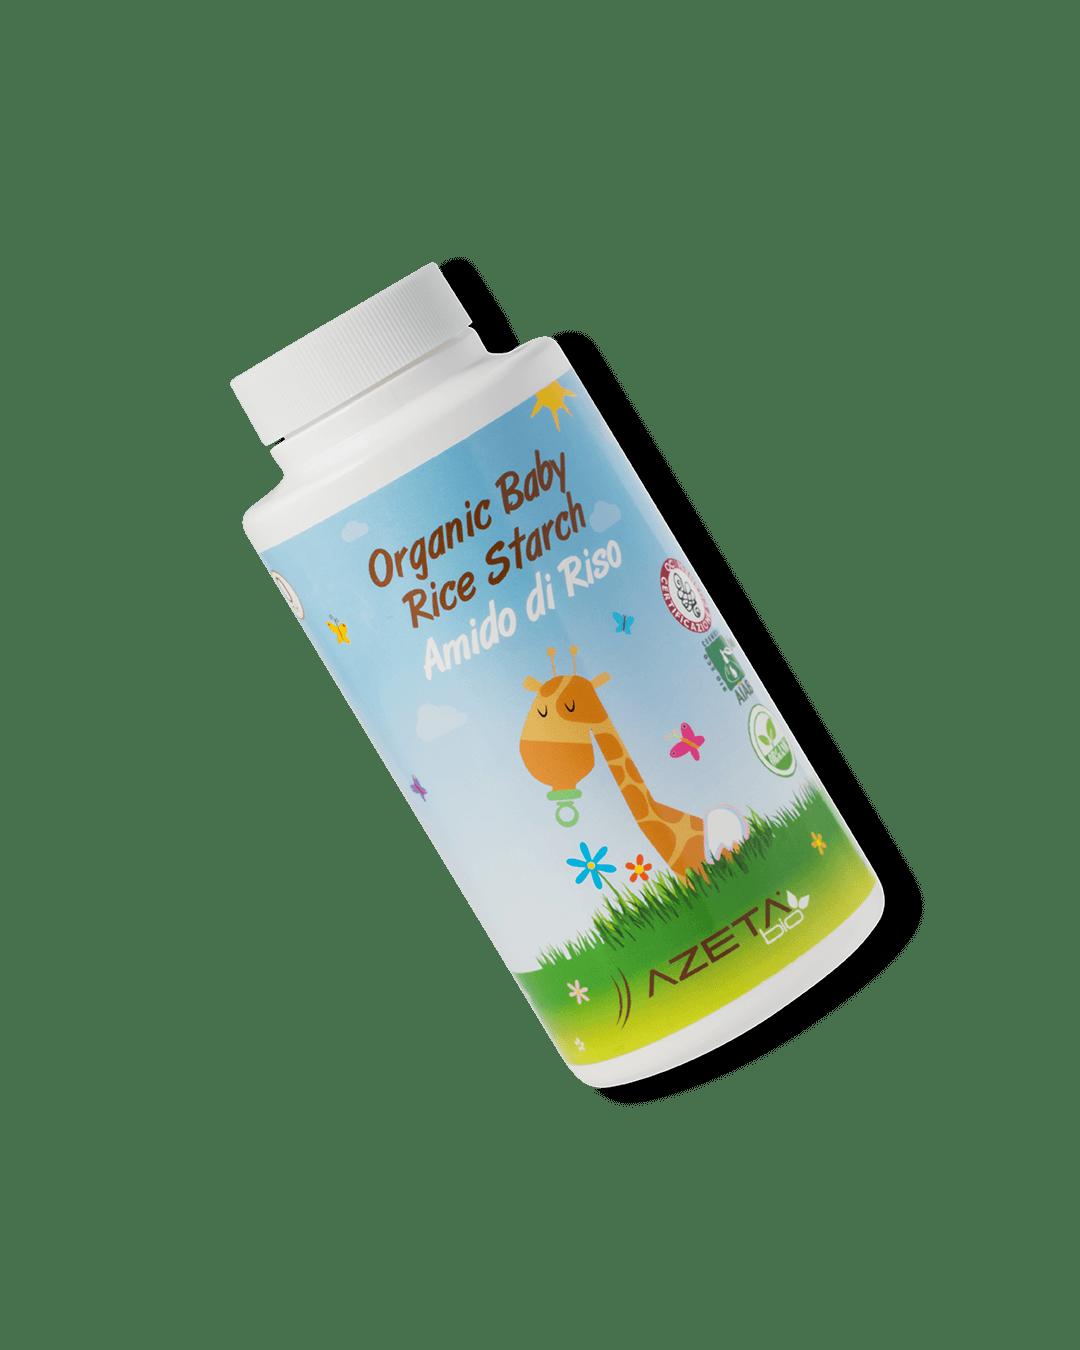 Organic Baby Rice Starch